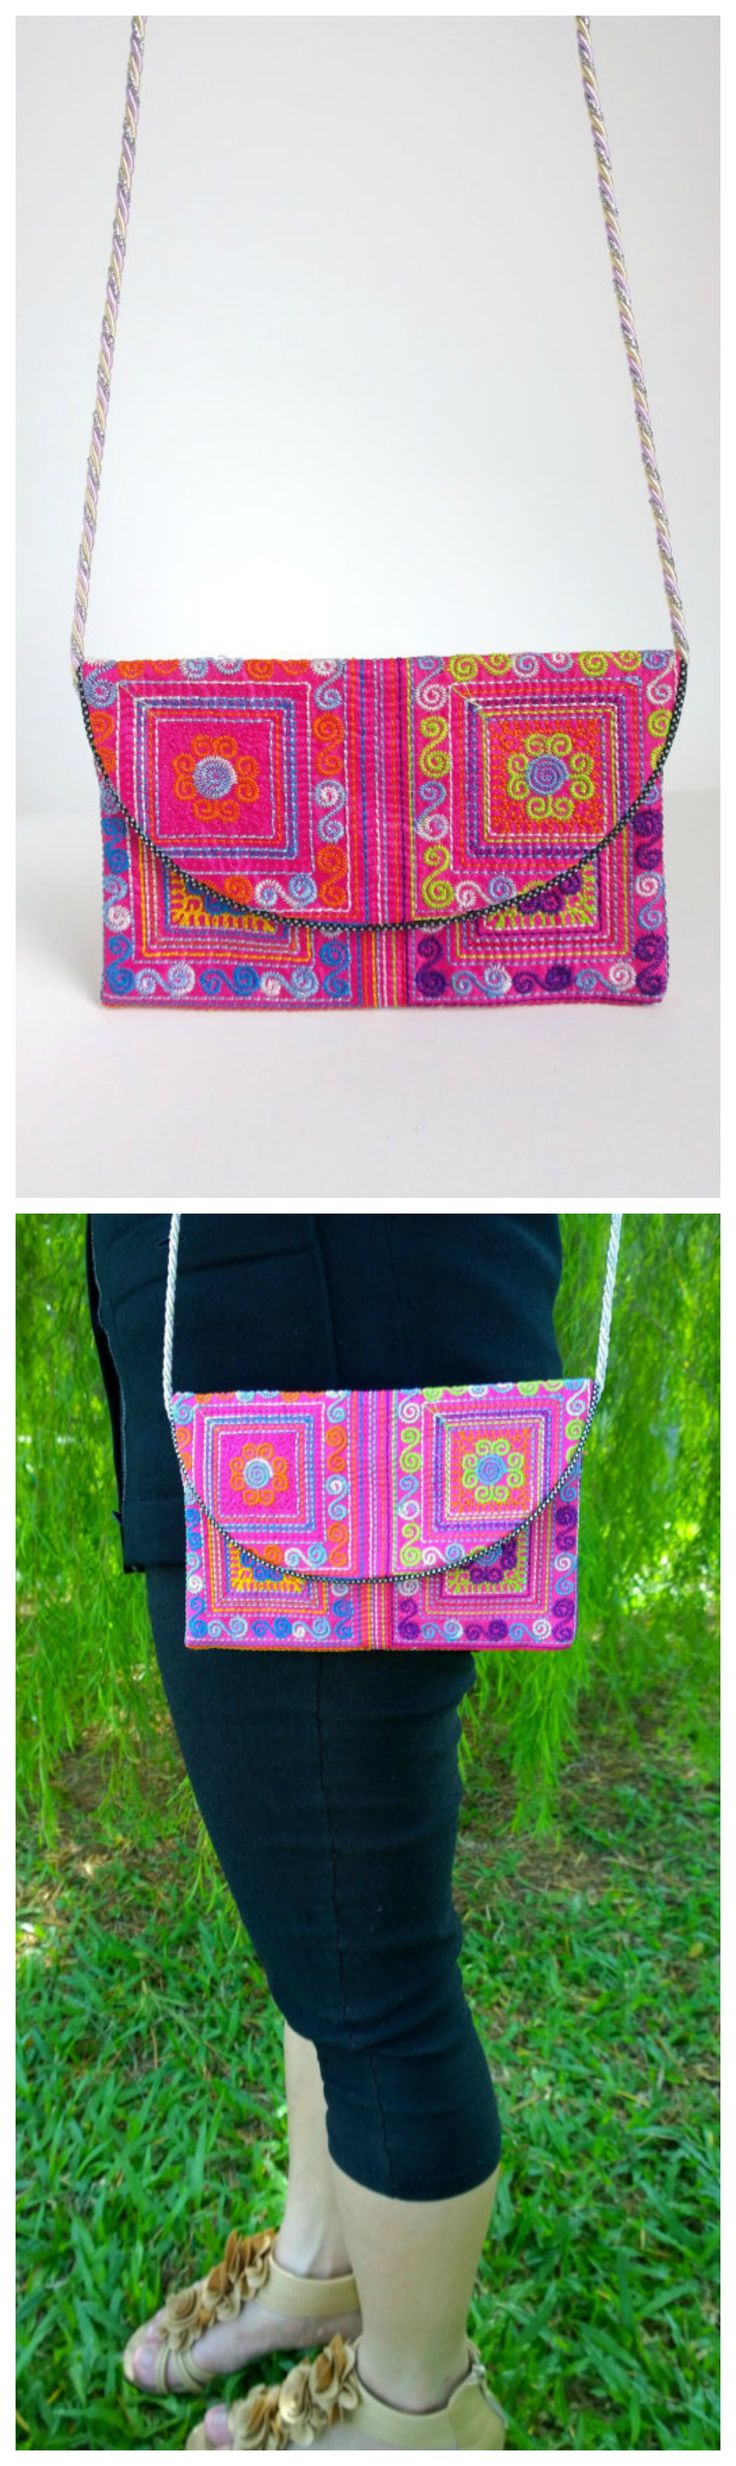 Tribal Crossbody Bag - boho gypsy bag - hmong ethnic bag ( FREE SHIPPING WORLDWIDE )